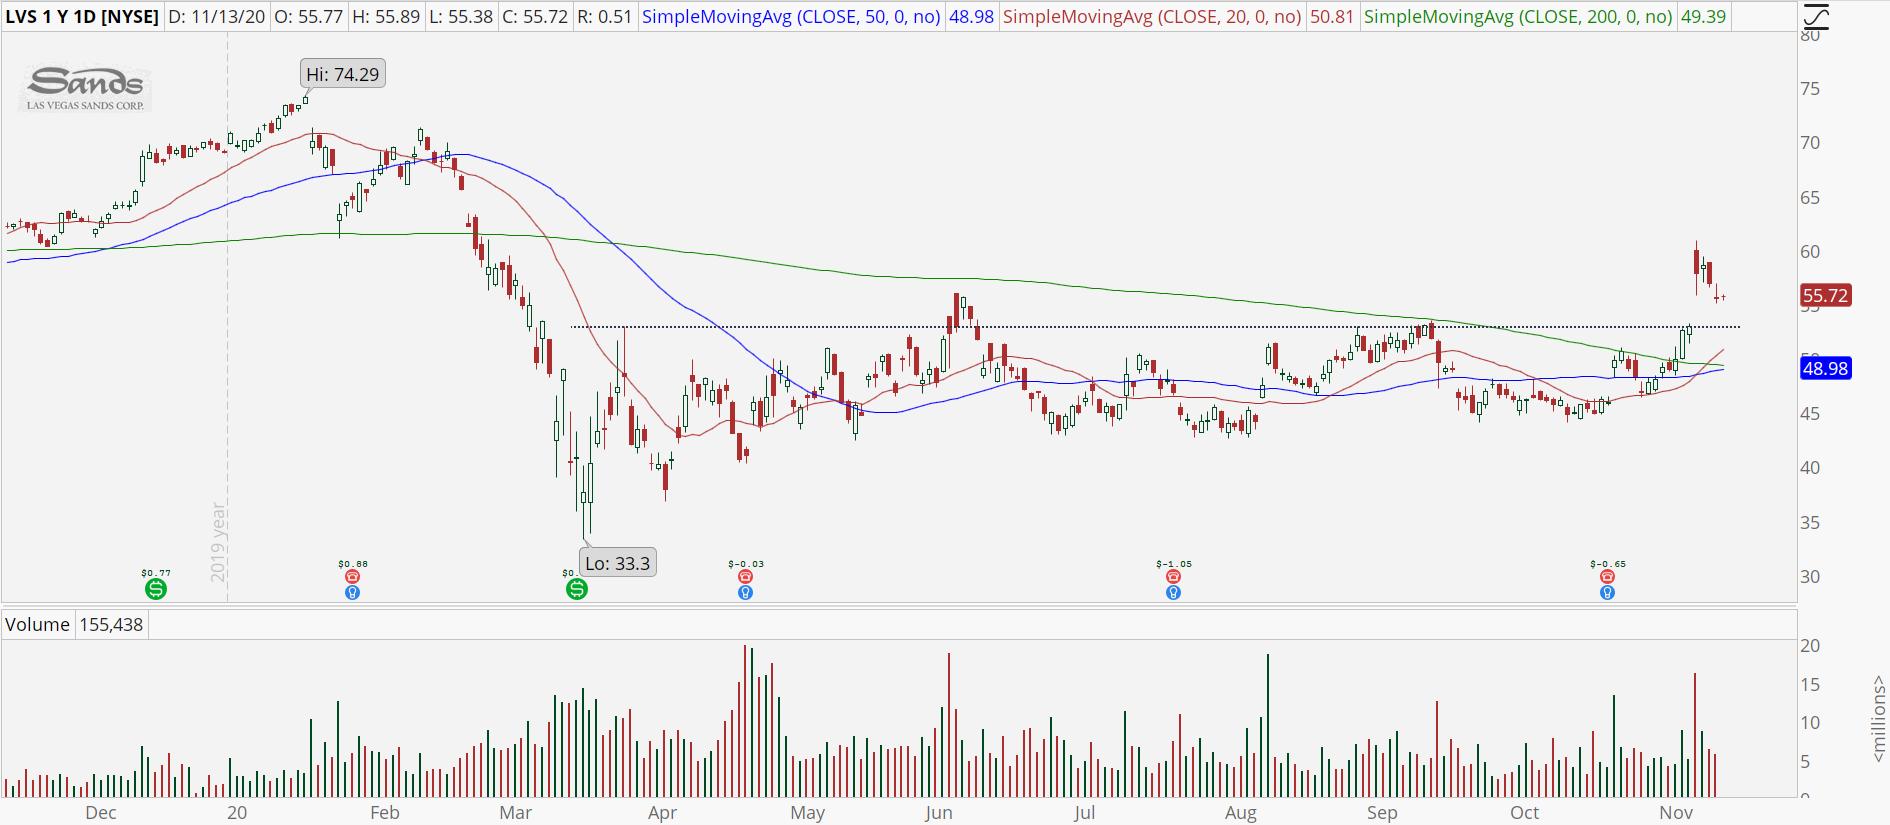 Las Vegas Sands (LVS) chart with bull retracement pattern